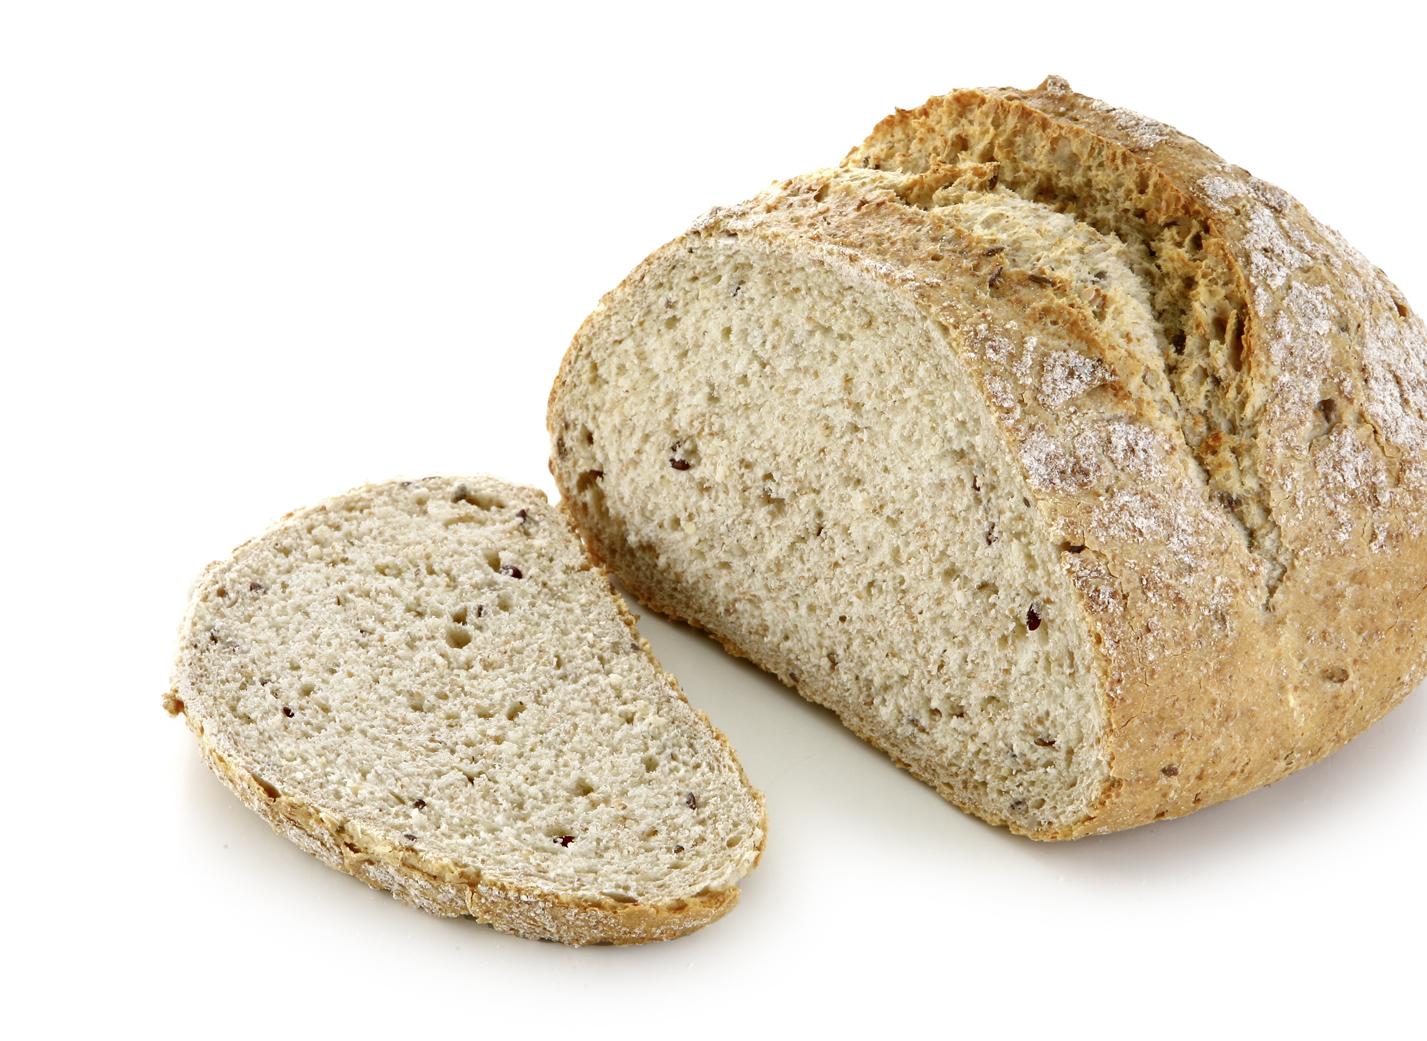 Spelt Bread - With spelt flakes, potato flakes, linseeds, sunflower kernels, sesame and sea salt/ diameter: approx. 18cm